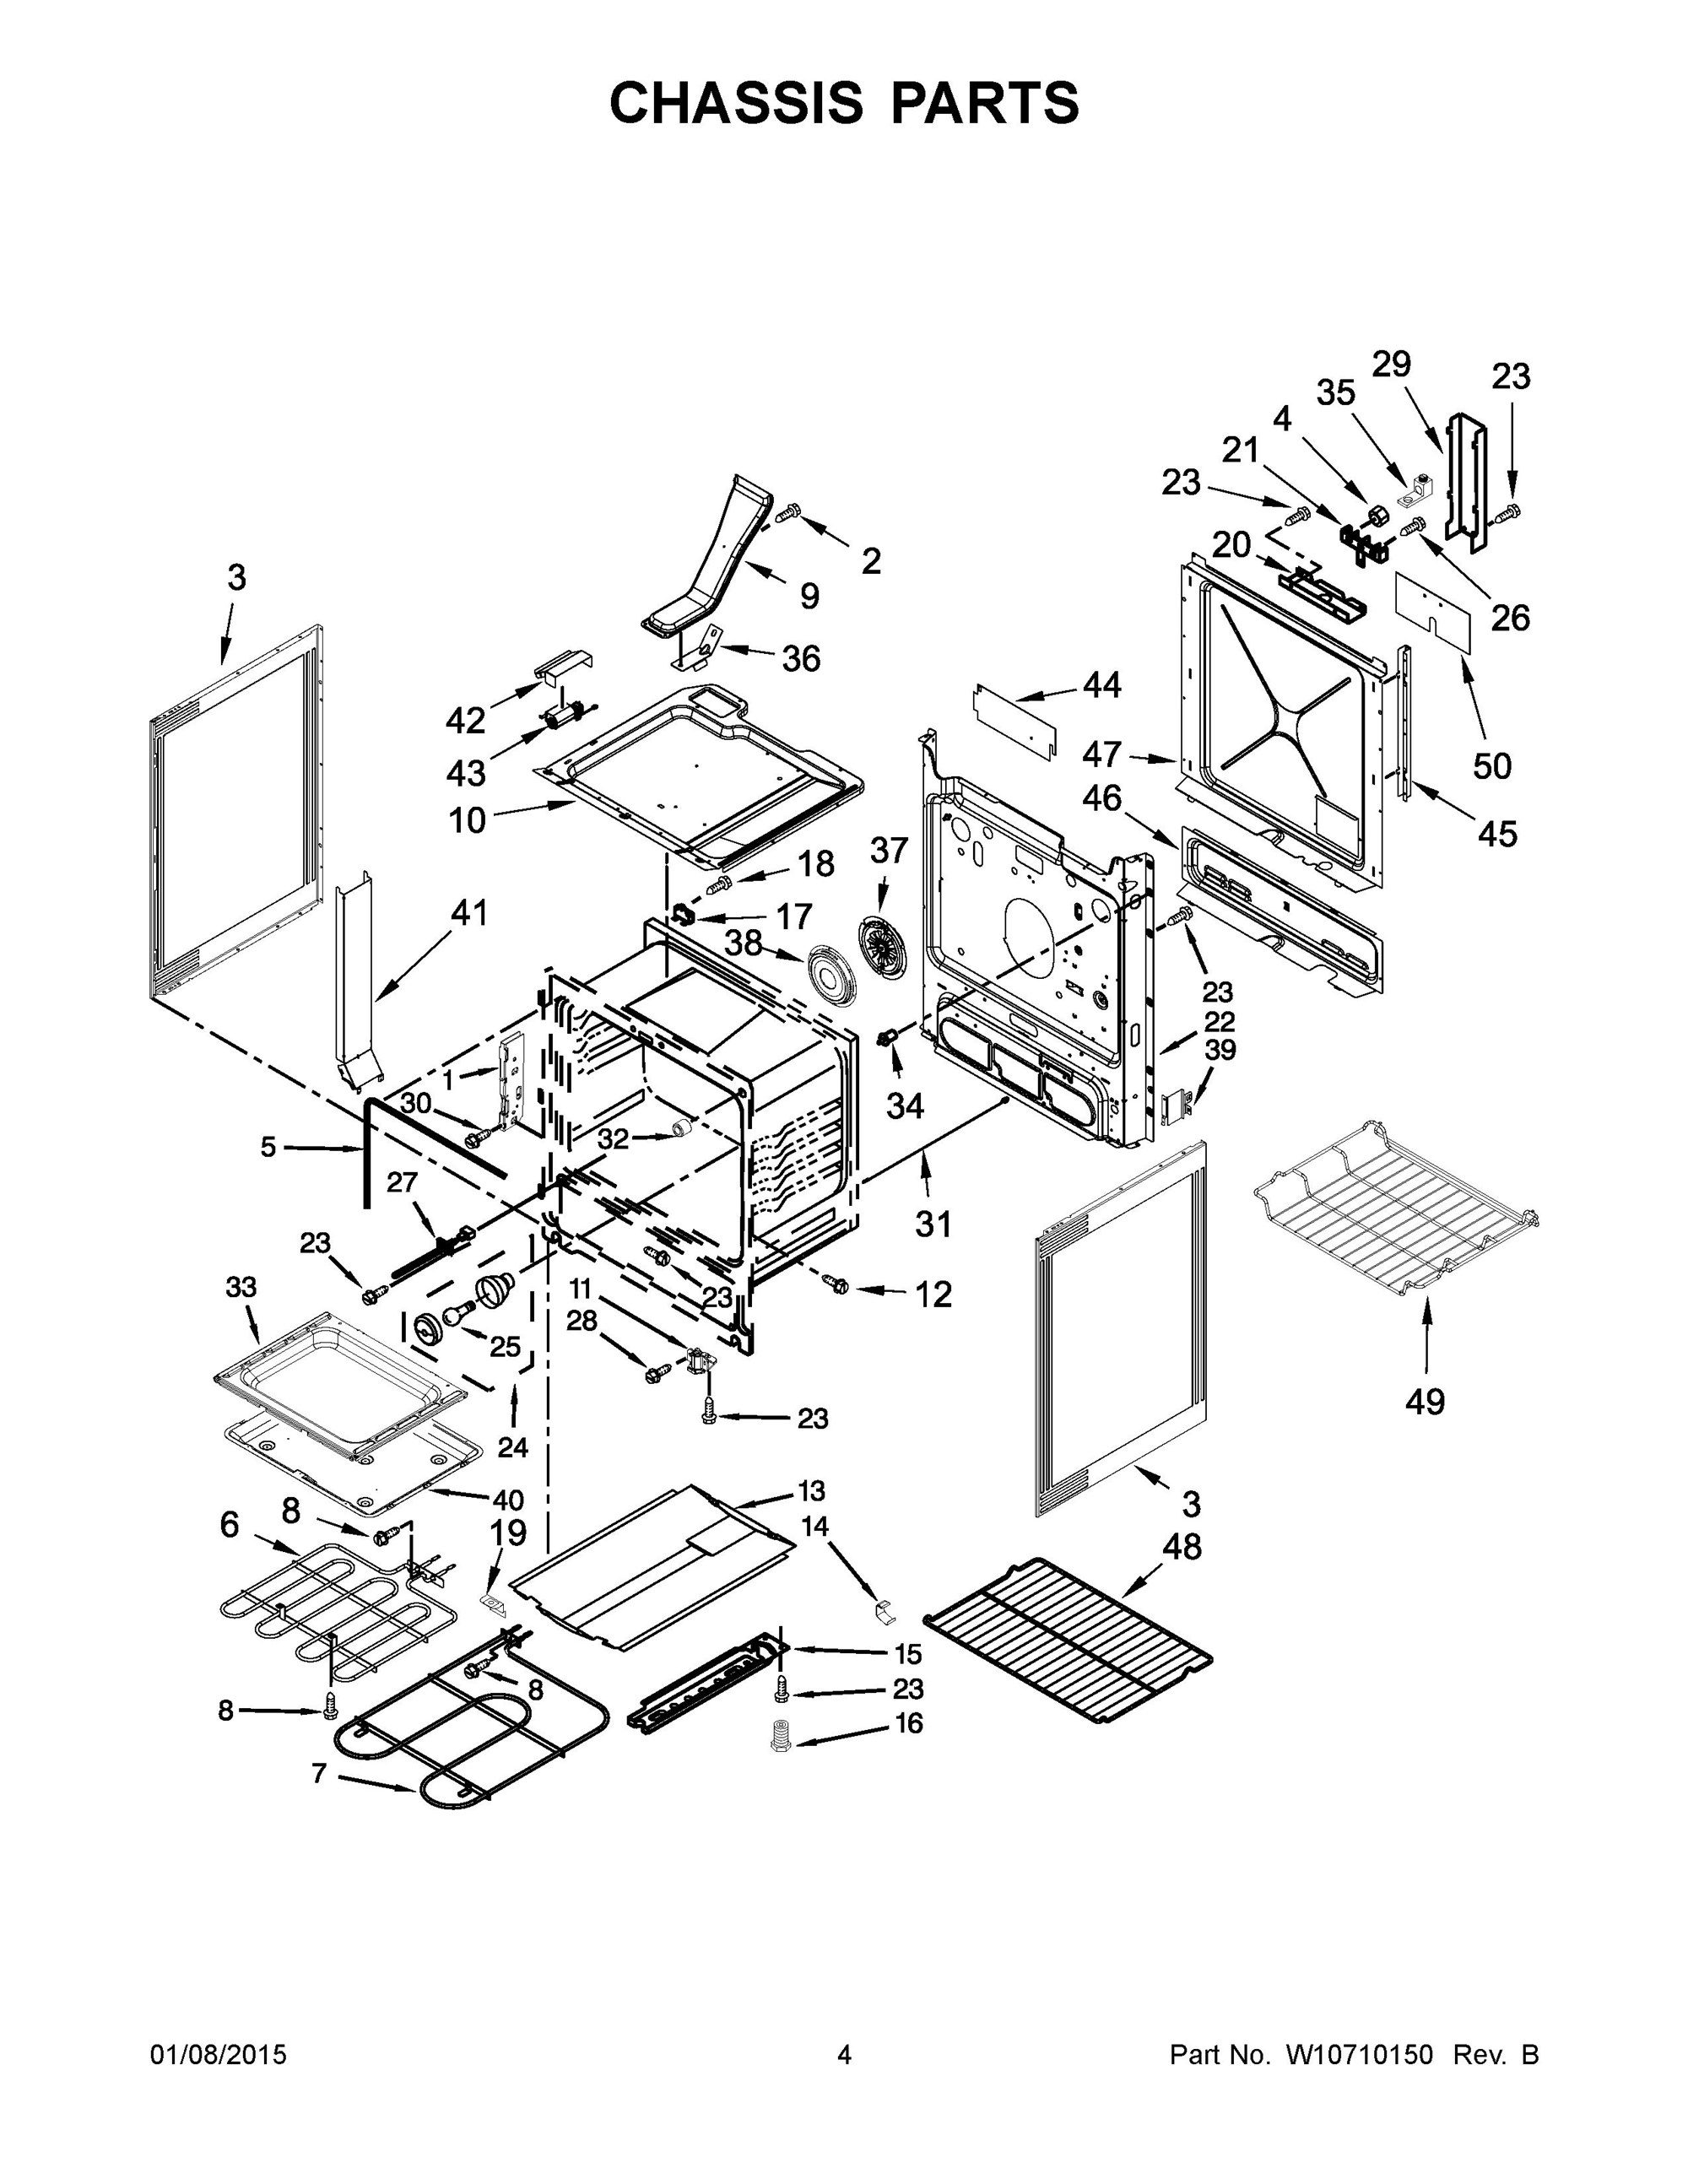 Wiring Dual Receptacles Diagram, Wiring, Get Free Image